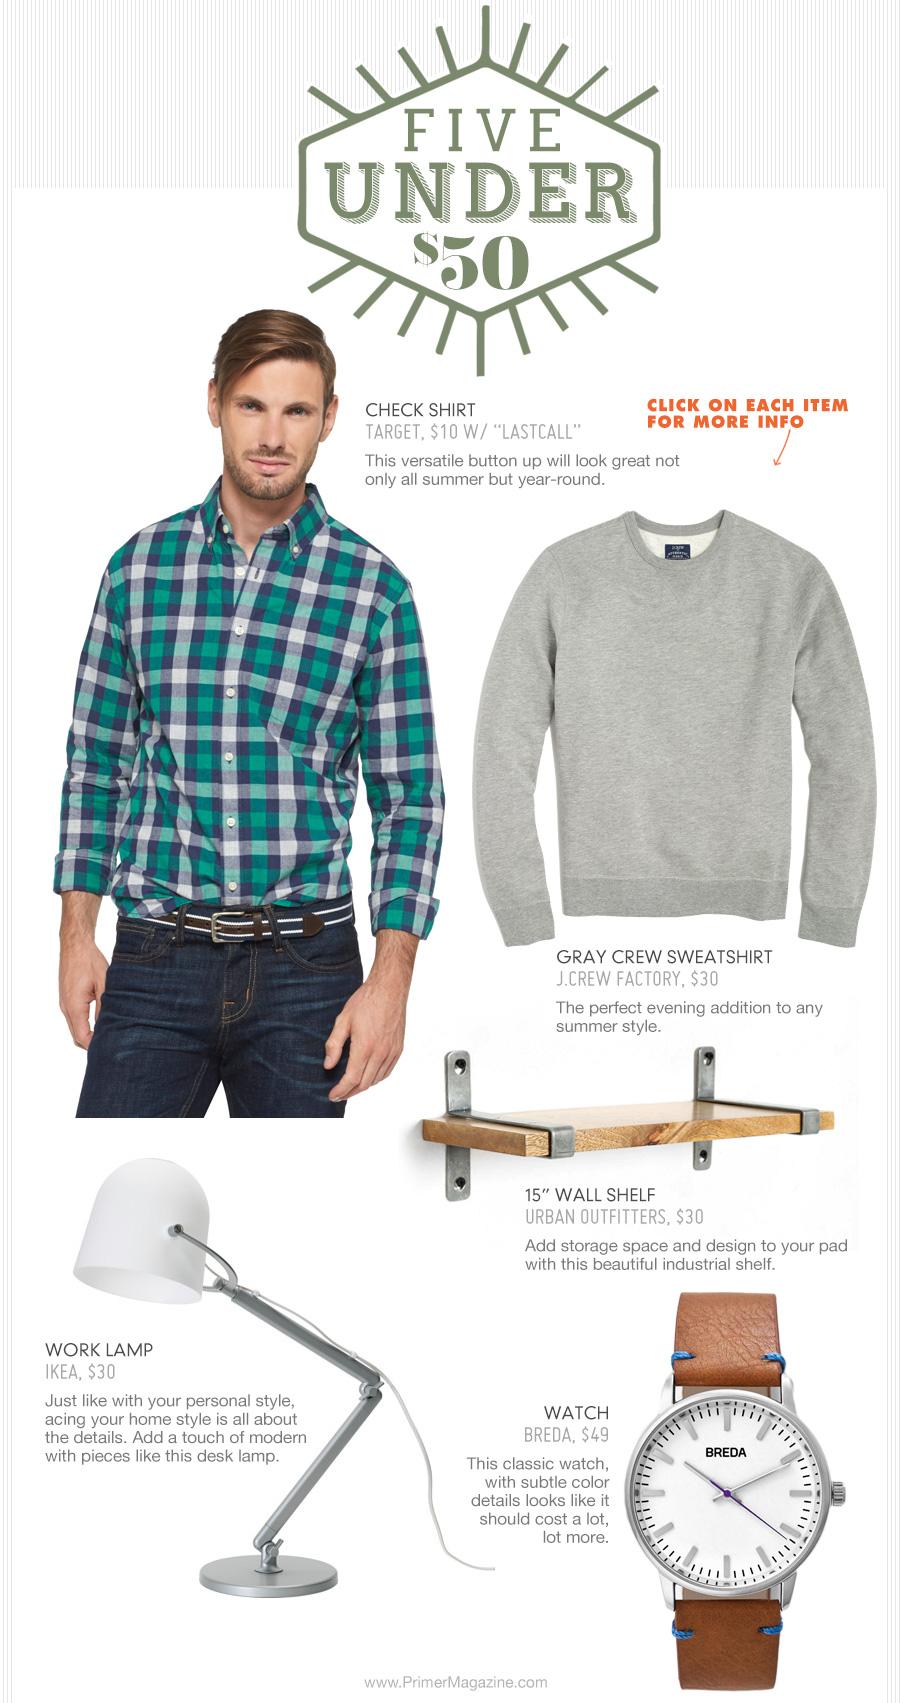 5 under 50 - plaid shirt, gray sweatshirt, shelf, desk lamp, watch